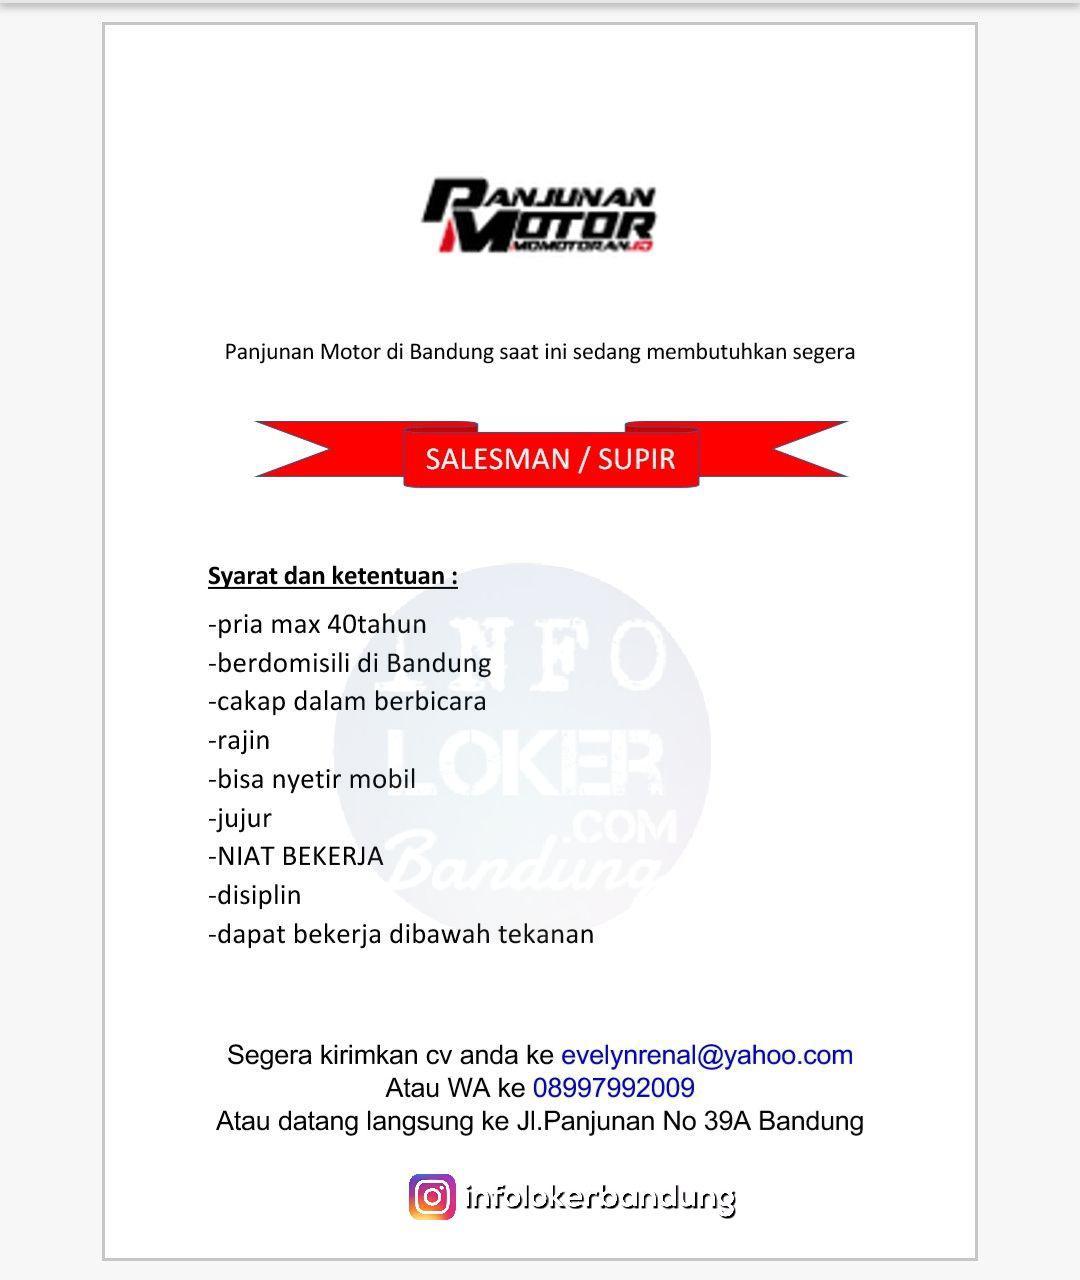 Lowongan Kerja Junjunan Motor Bandung Maret 2018